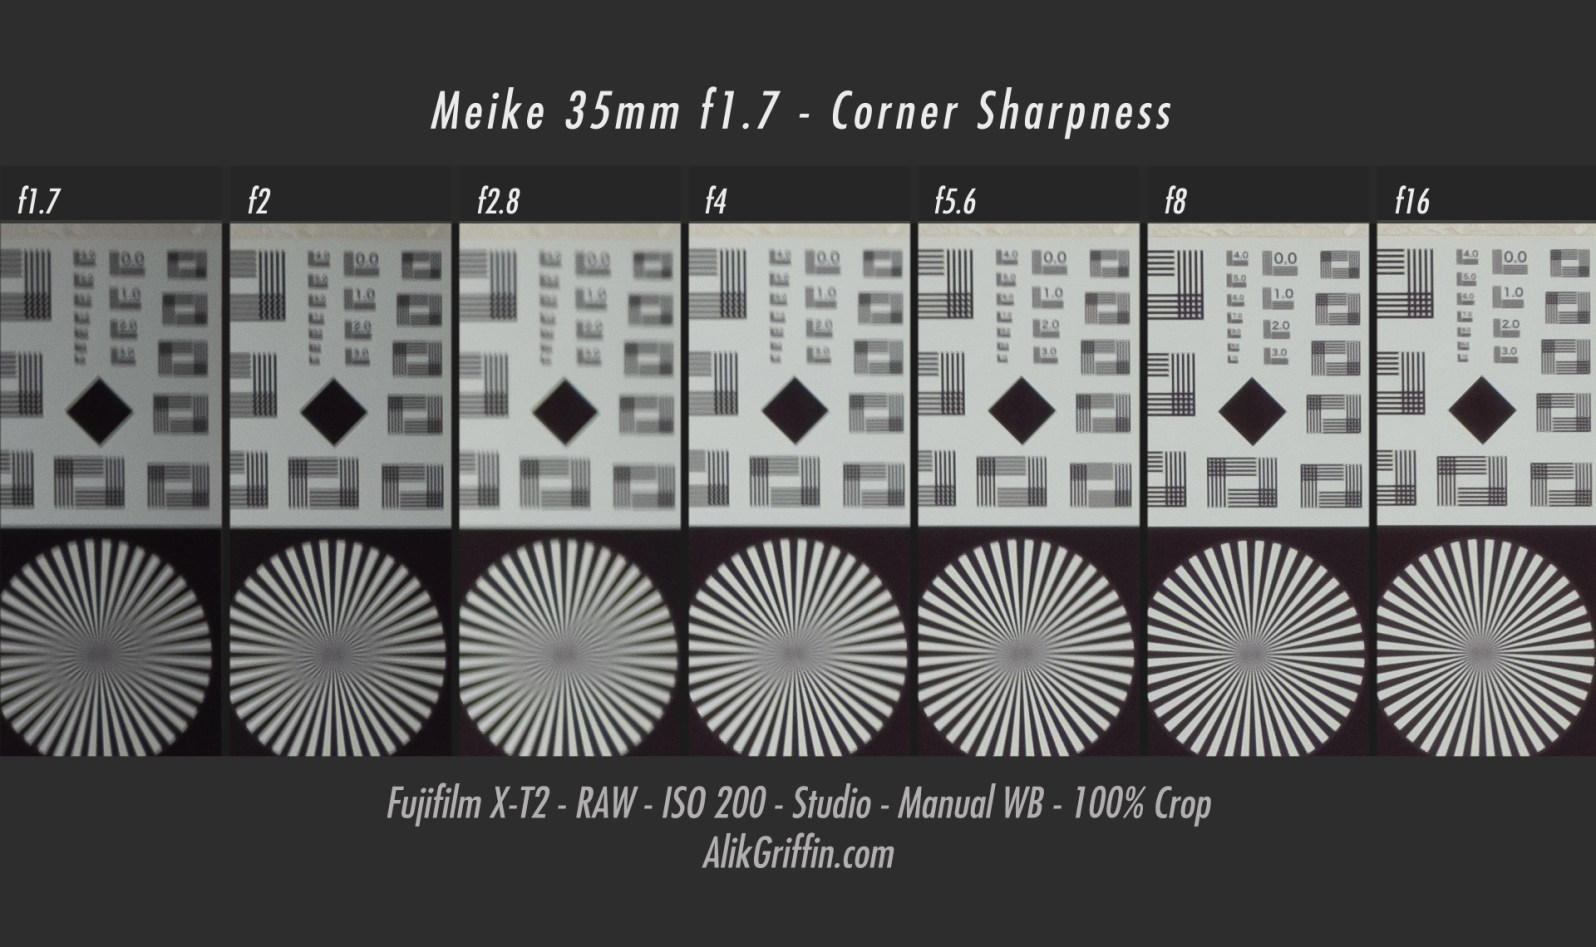 Meike 35mm f1.7 Corner Sharpness Chart